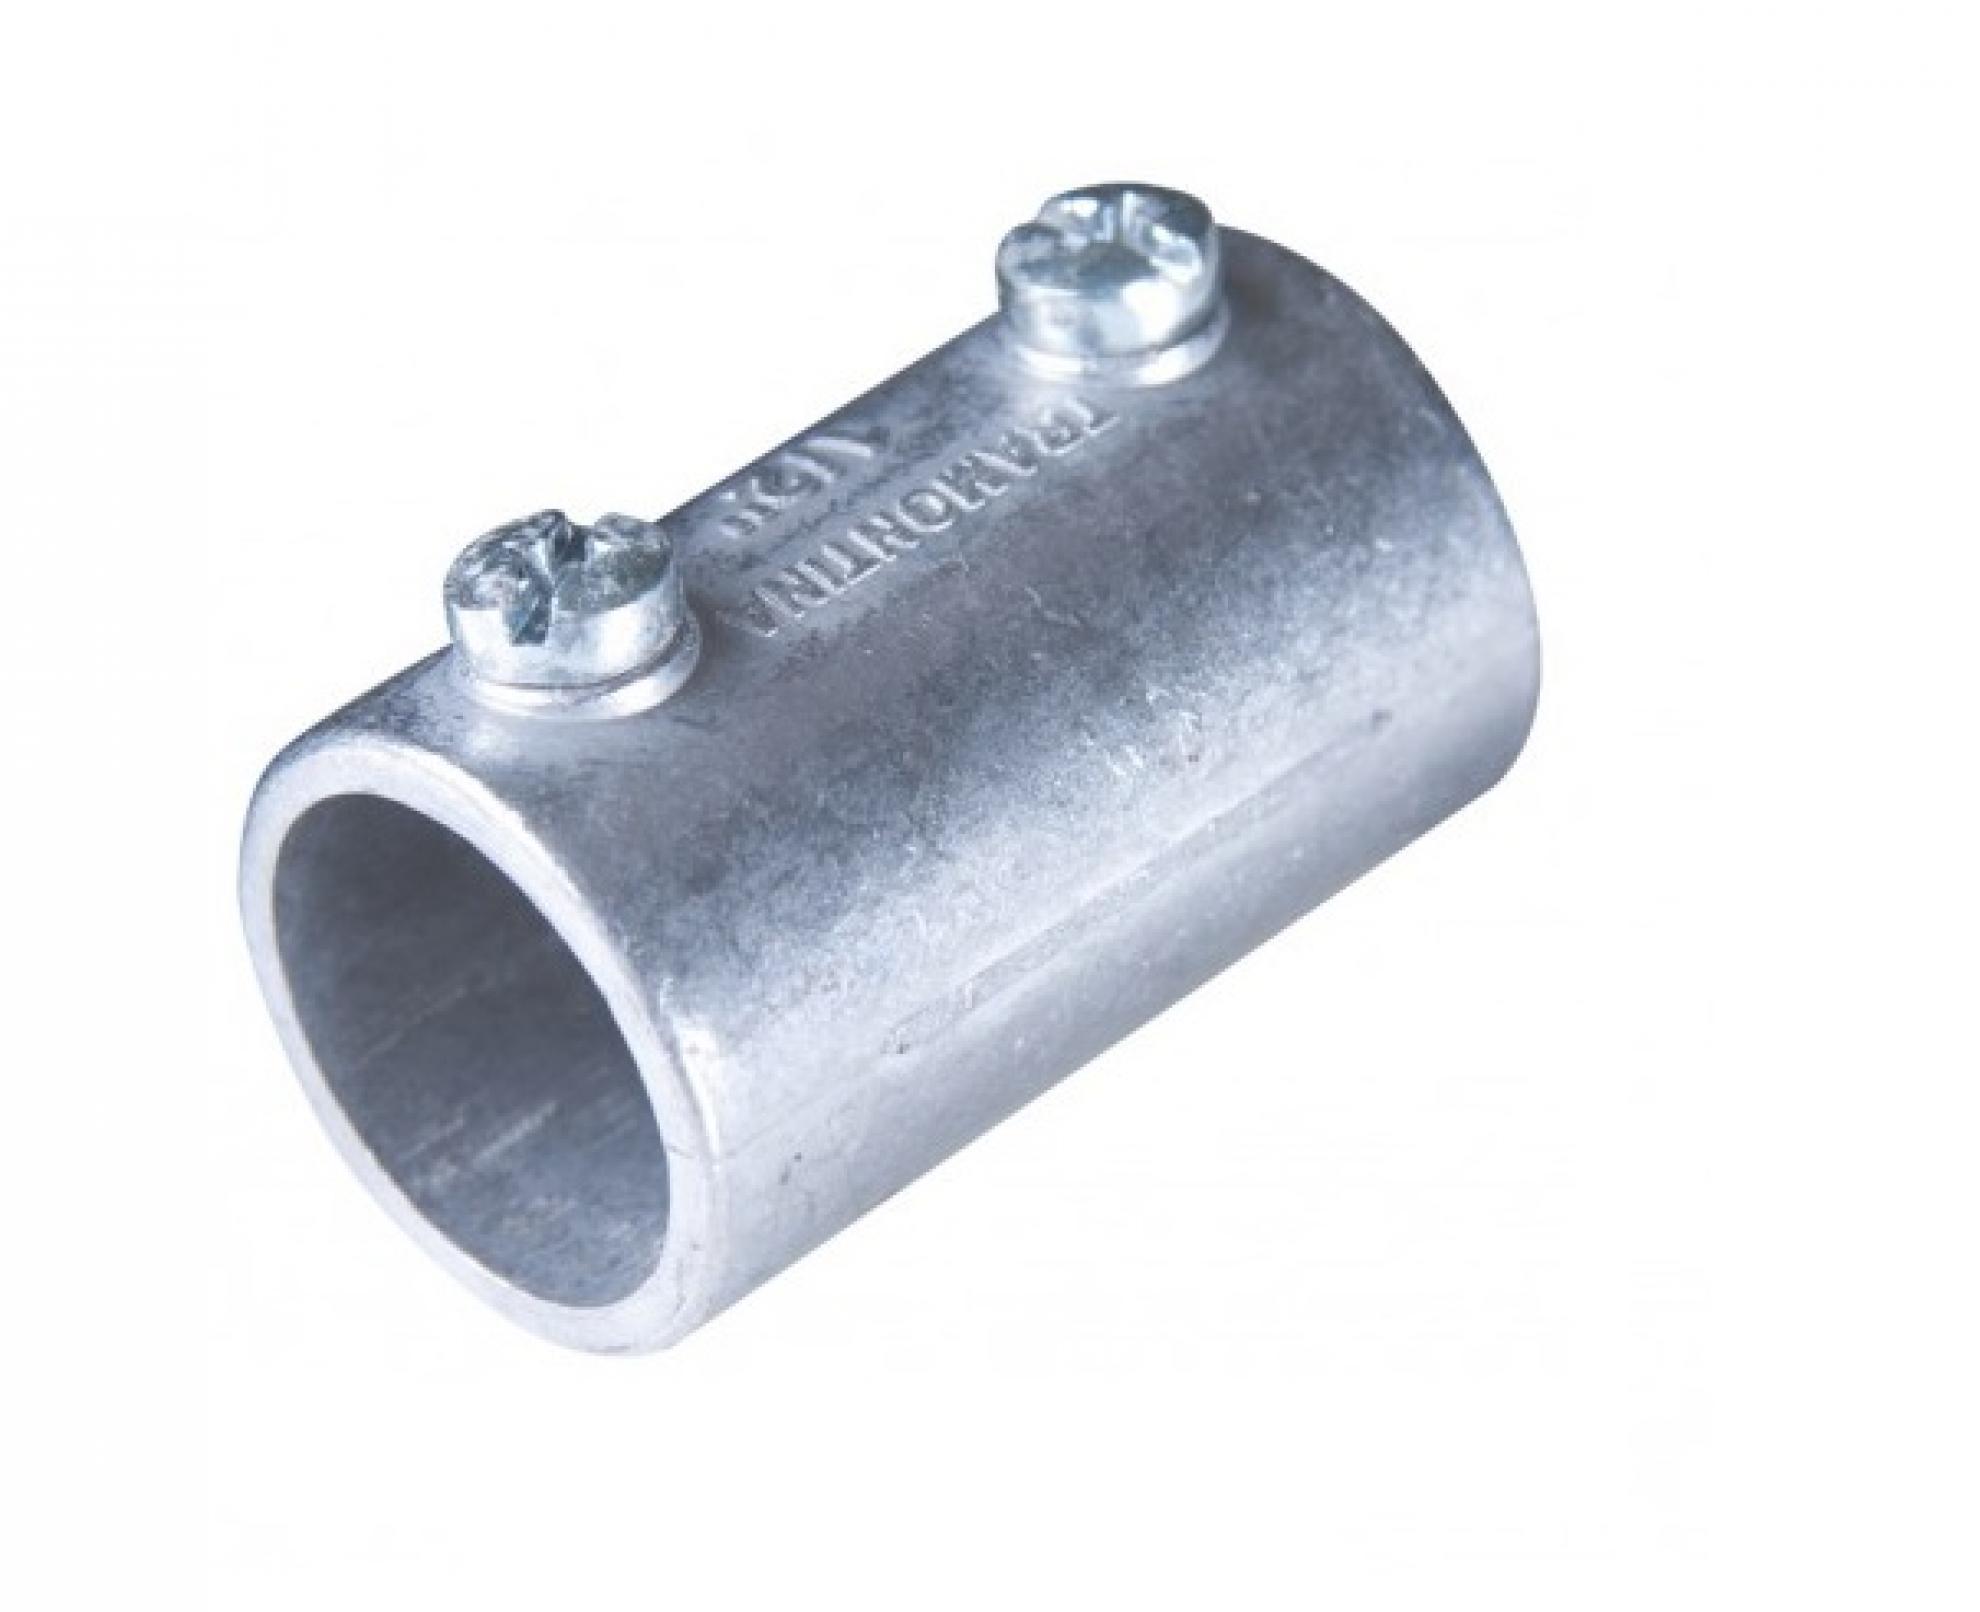 "Luva de emenda Lisa 2"" Aluminio- Flexor"